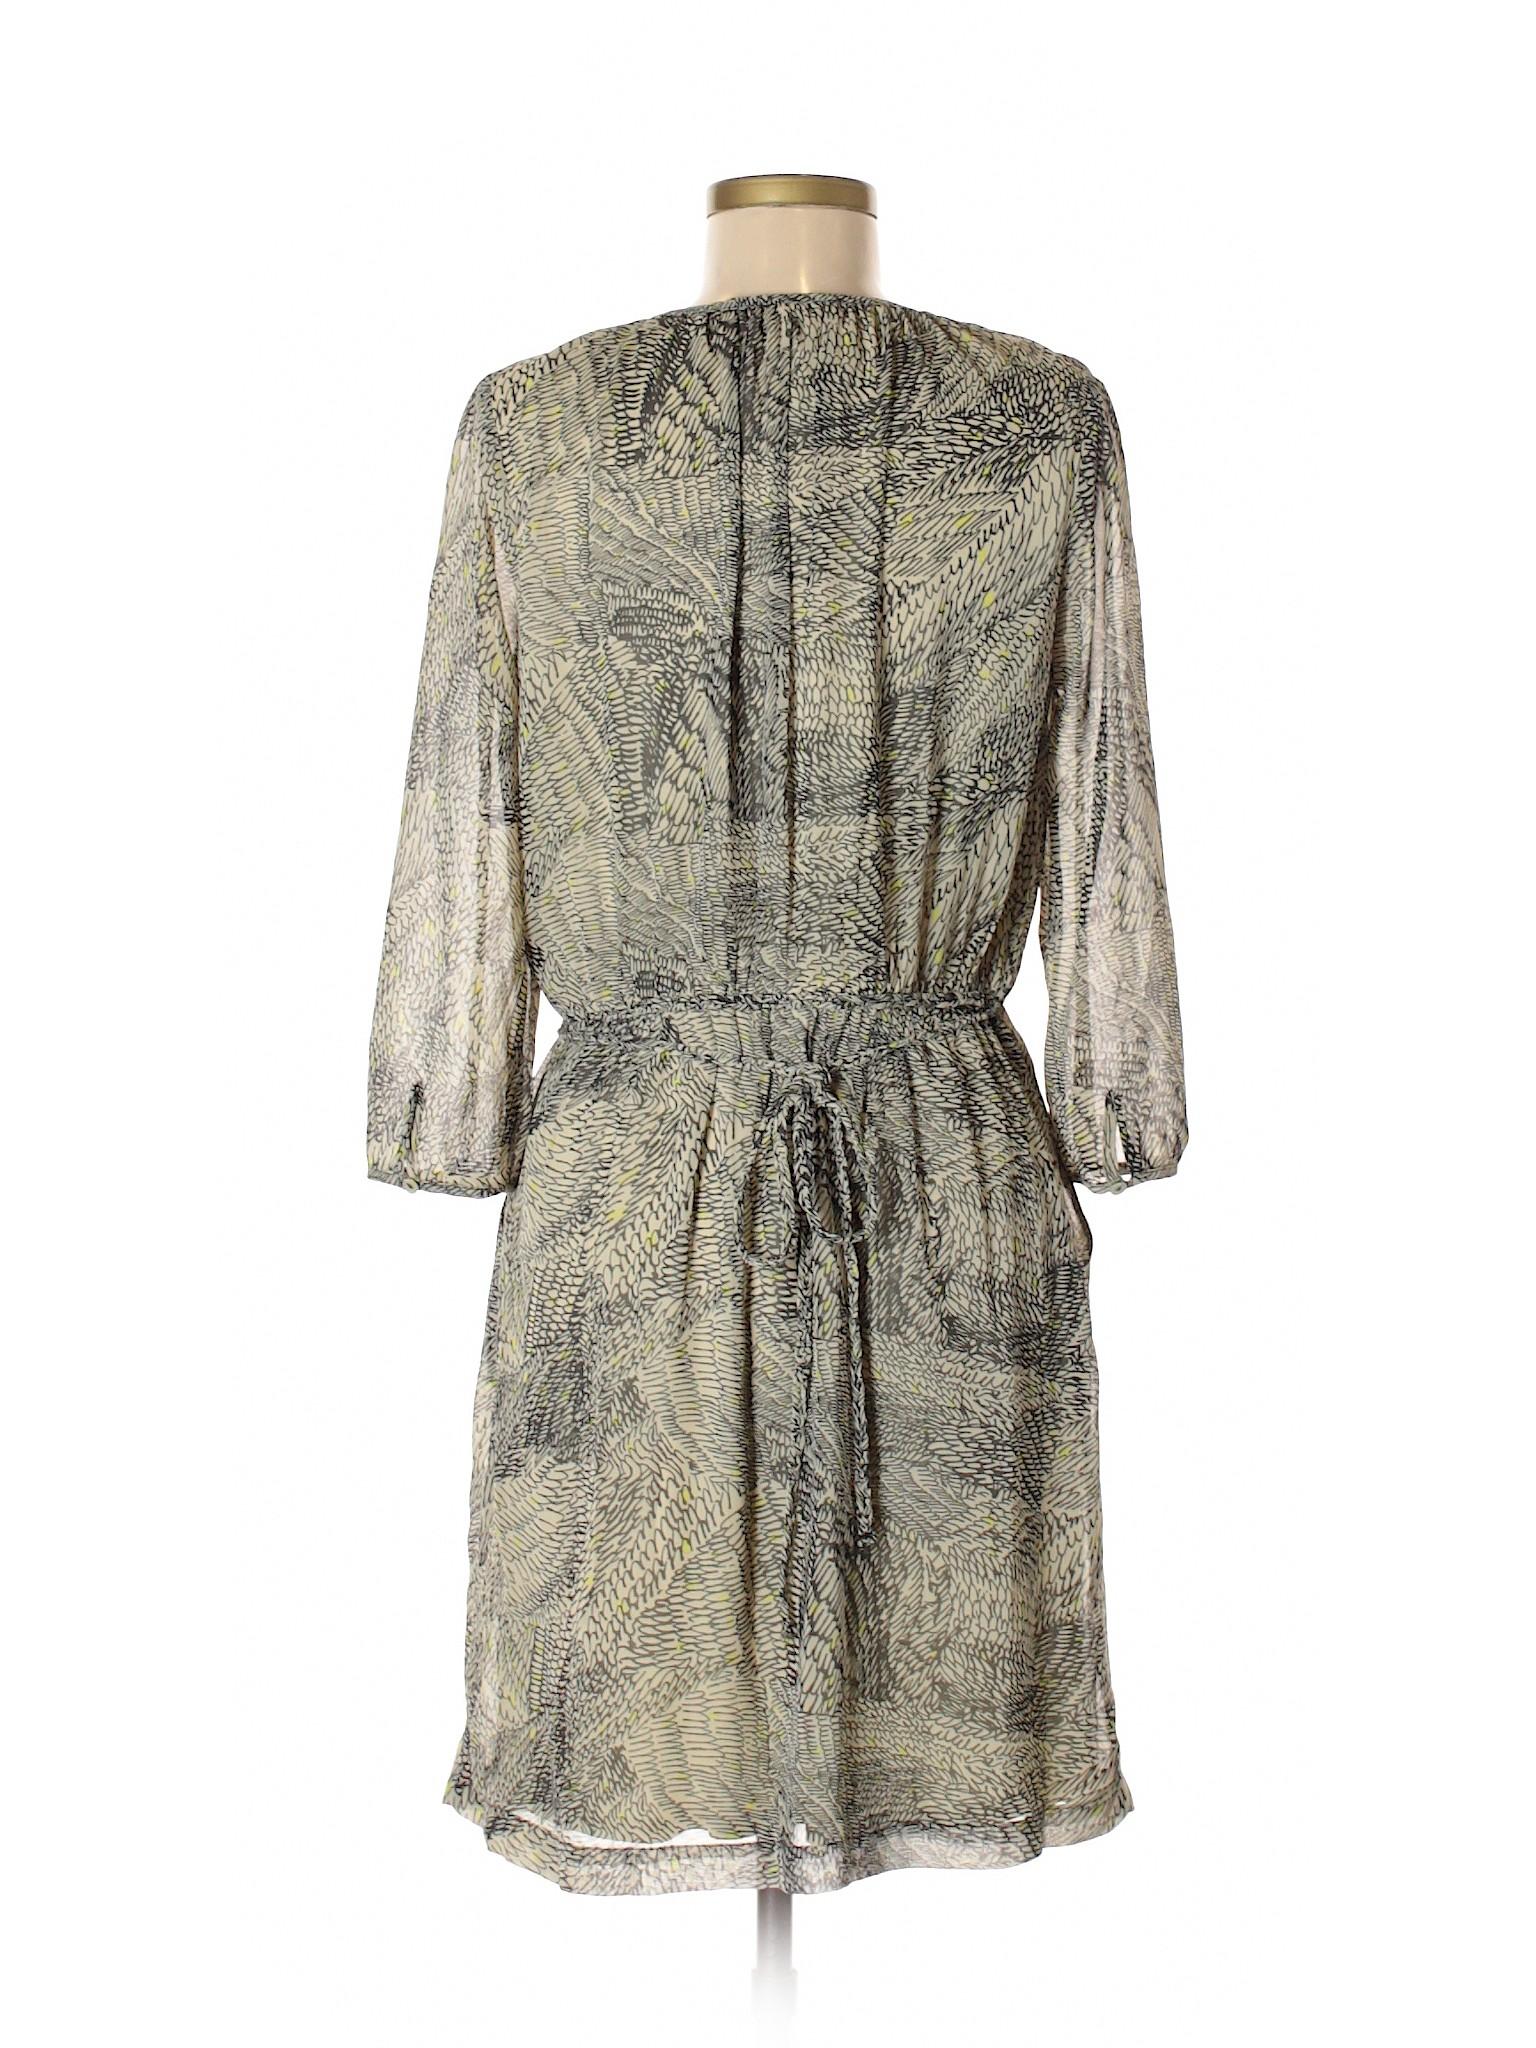 winter Rainn Daniel Casual Boutique Dress Sn1Bq1W